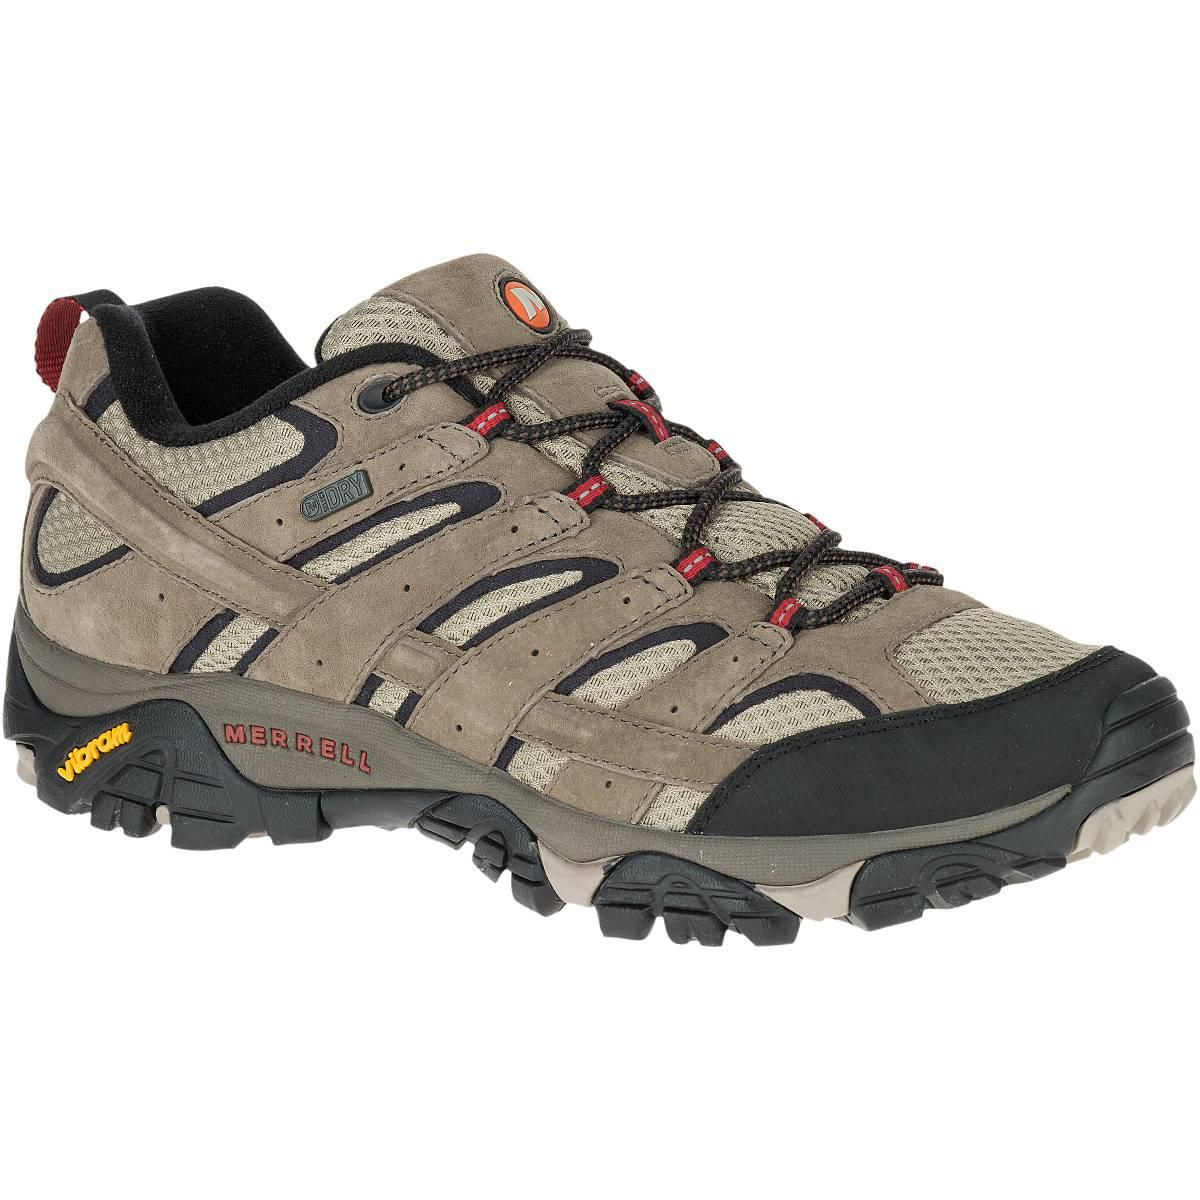 Merrell Moab 2 Waterproof Hiking Shoes Men's